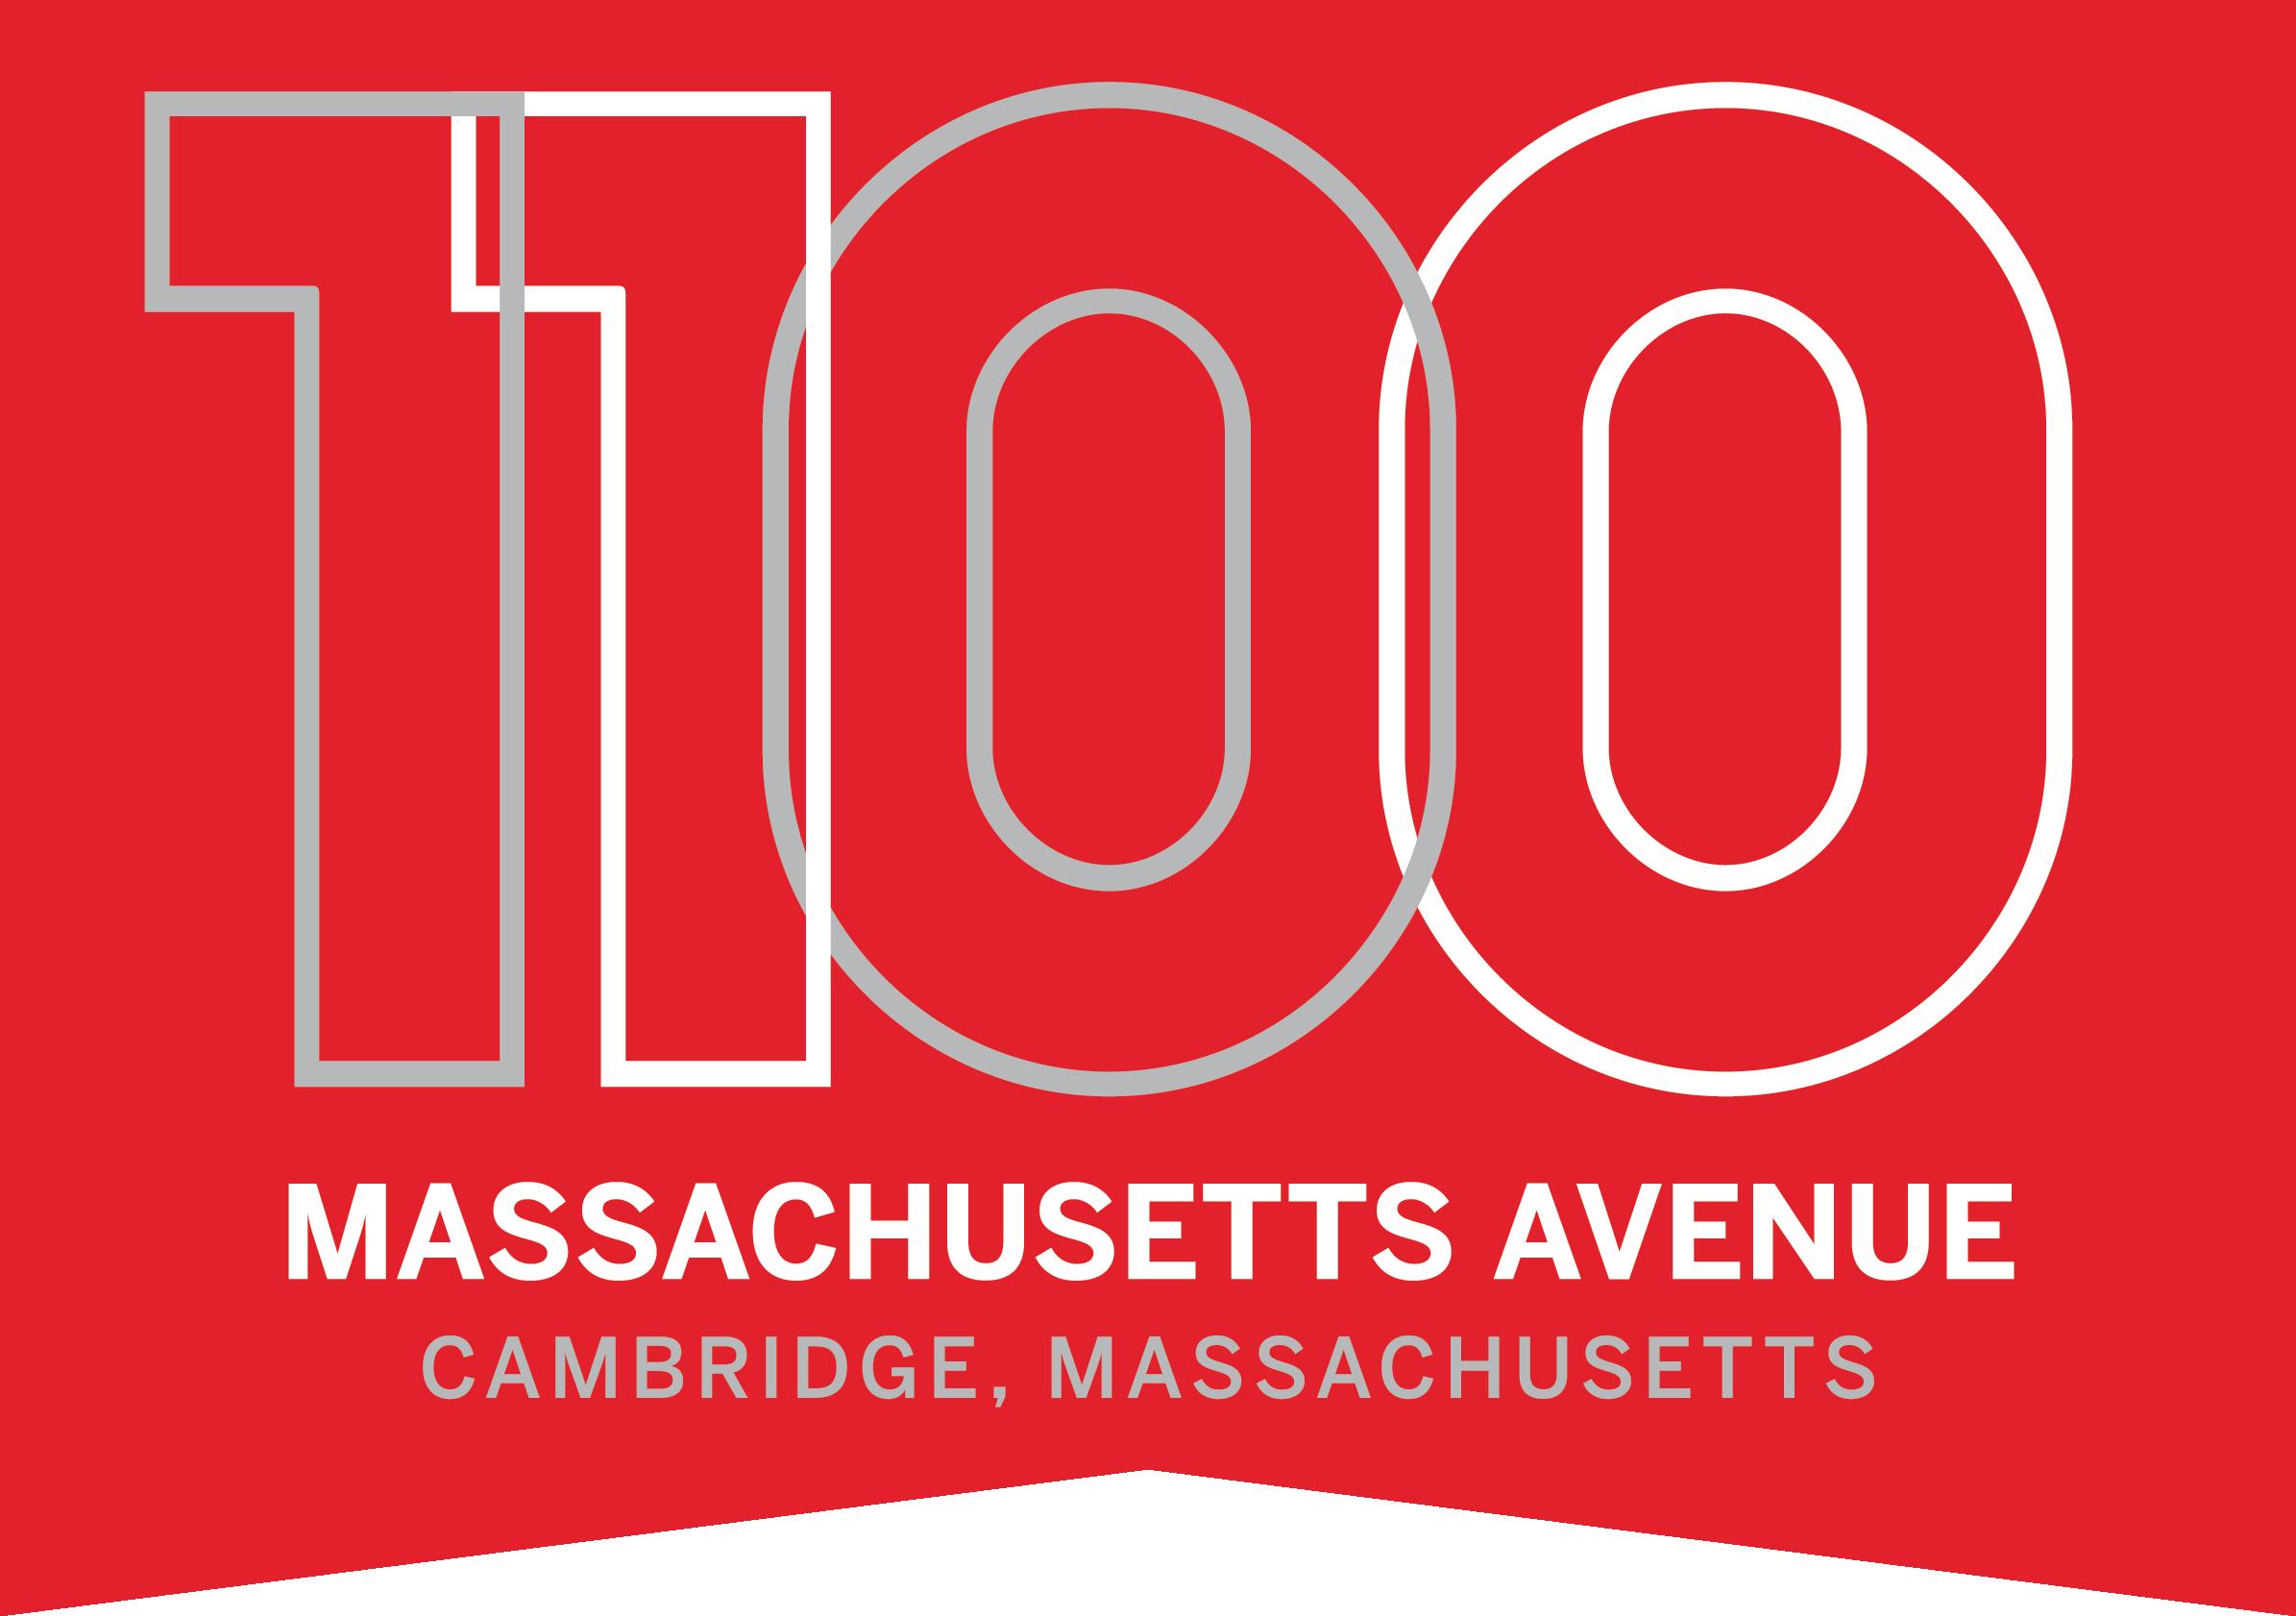 1100 Massachusetts Avenue